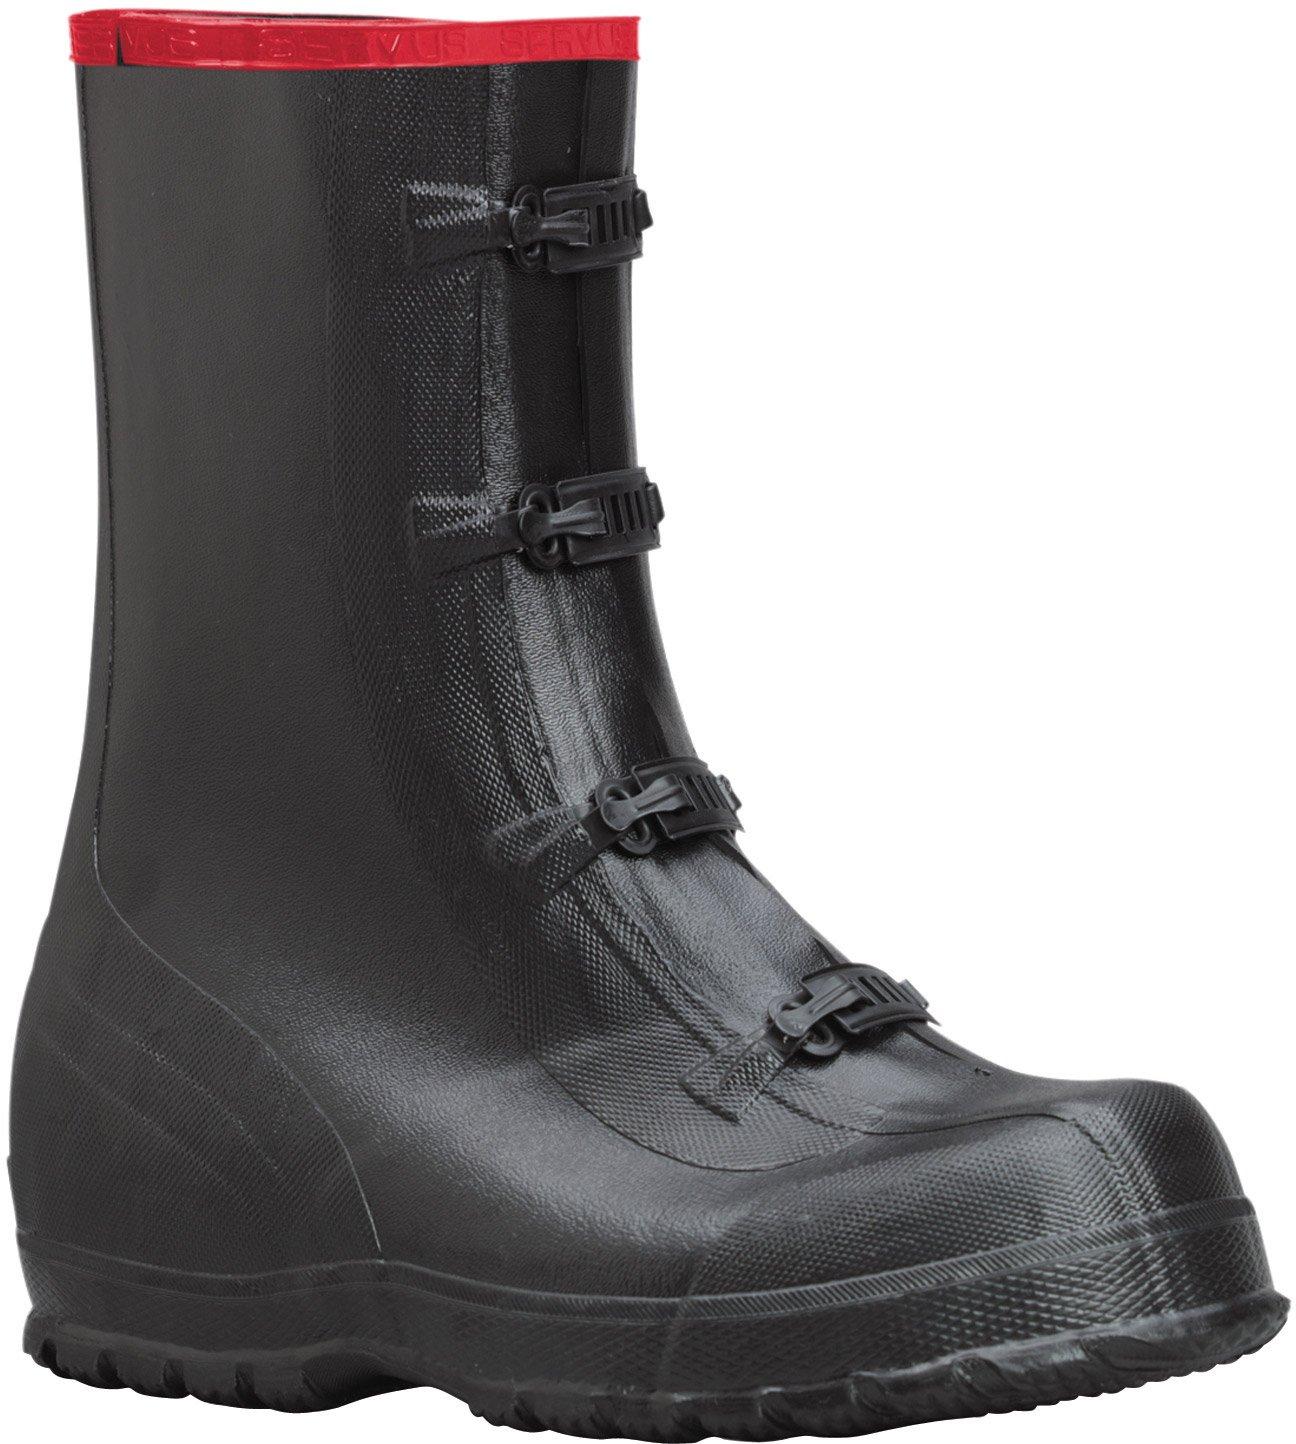 "Ranger 13"" Rubber Supersized Men's Overboots, Black (T419)"